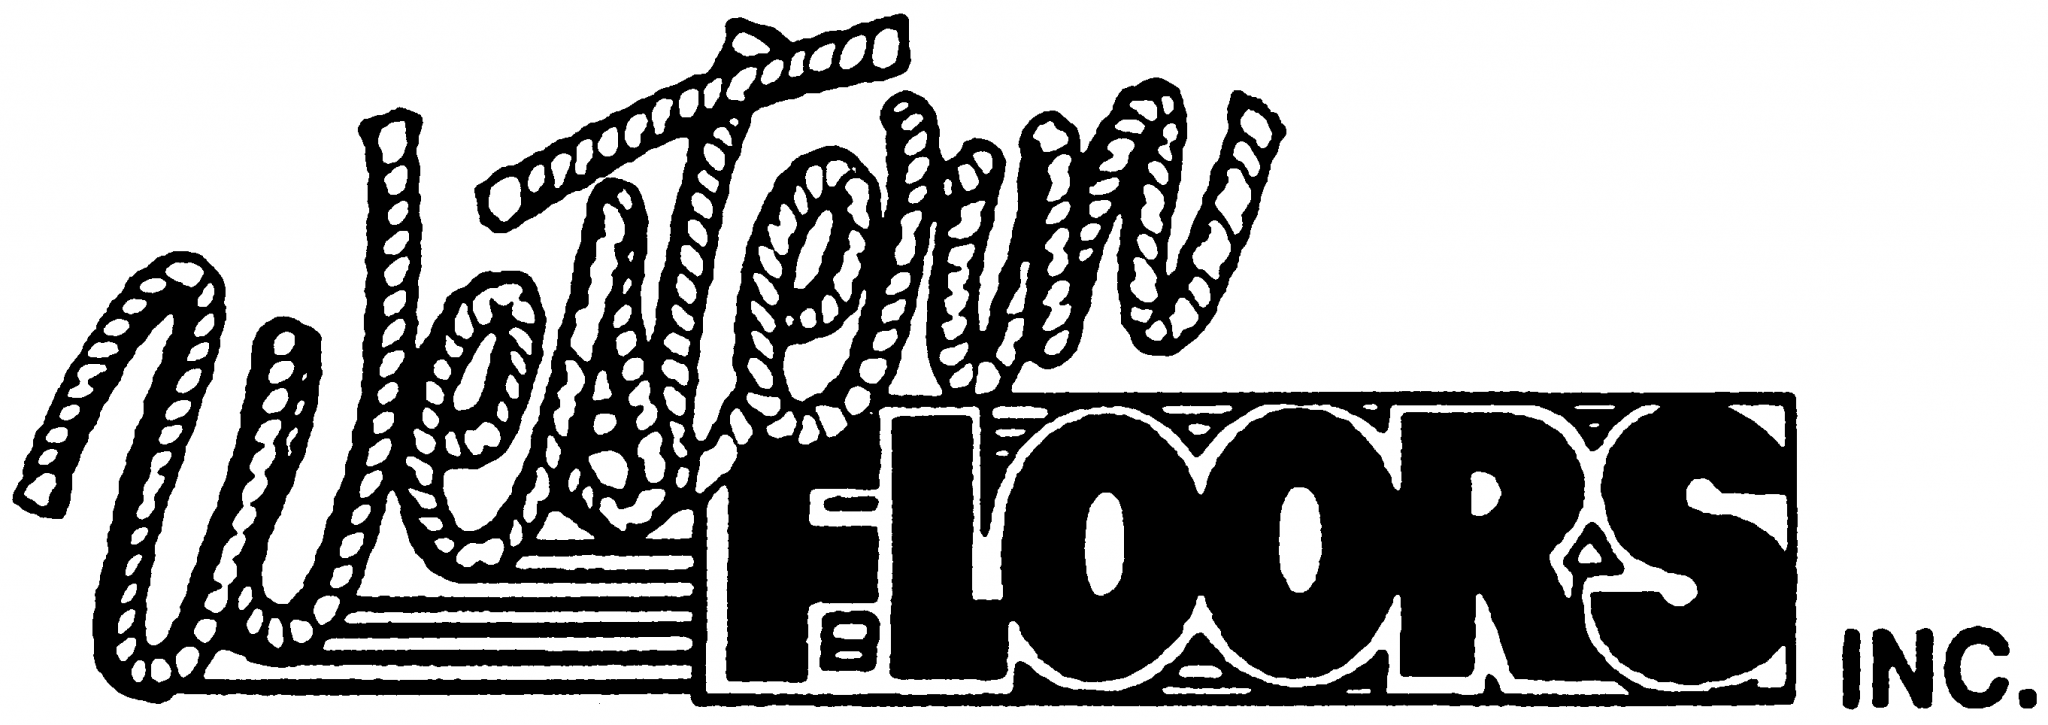 WESTERN FLOORS LOGO (1)